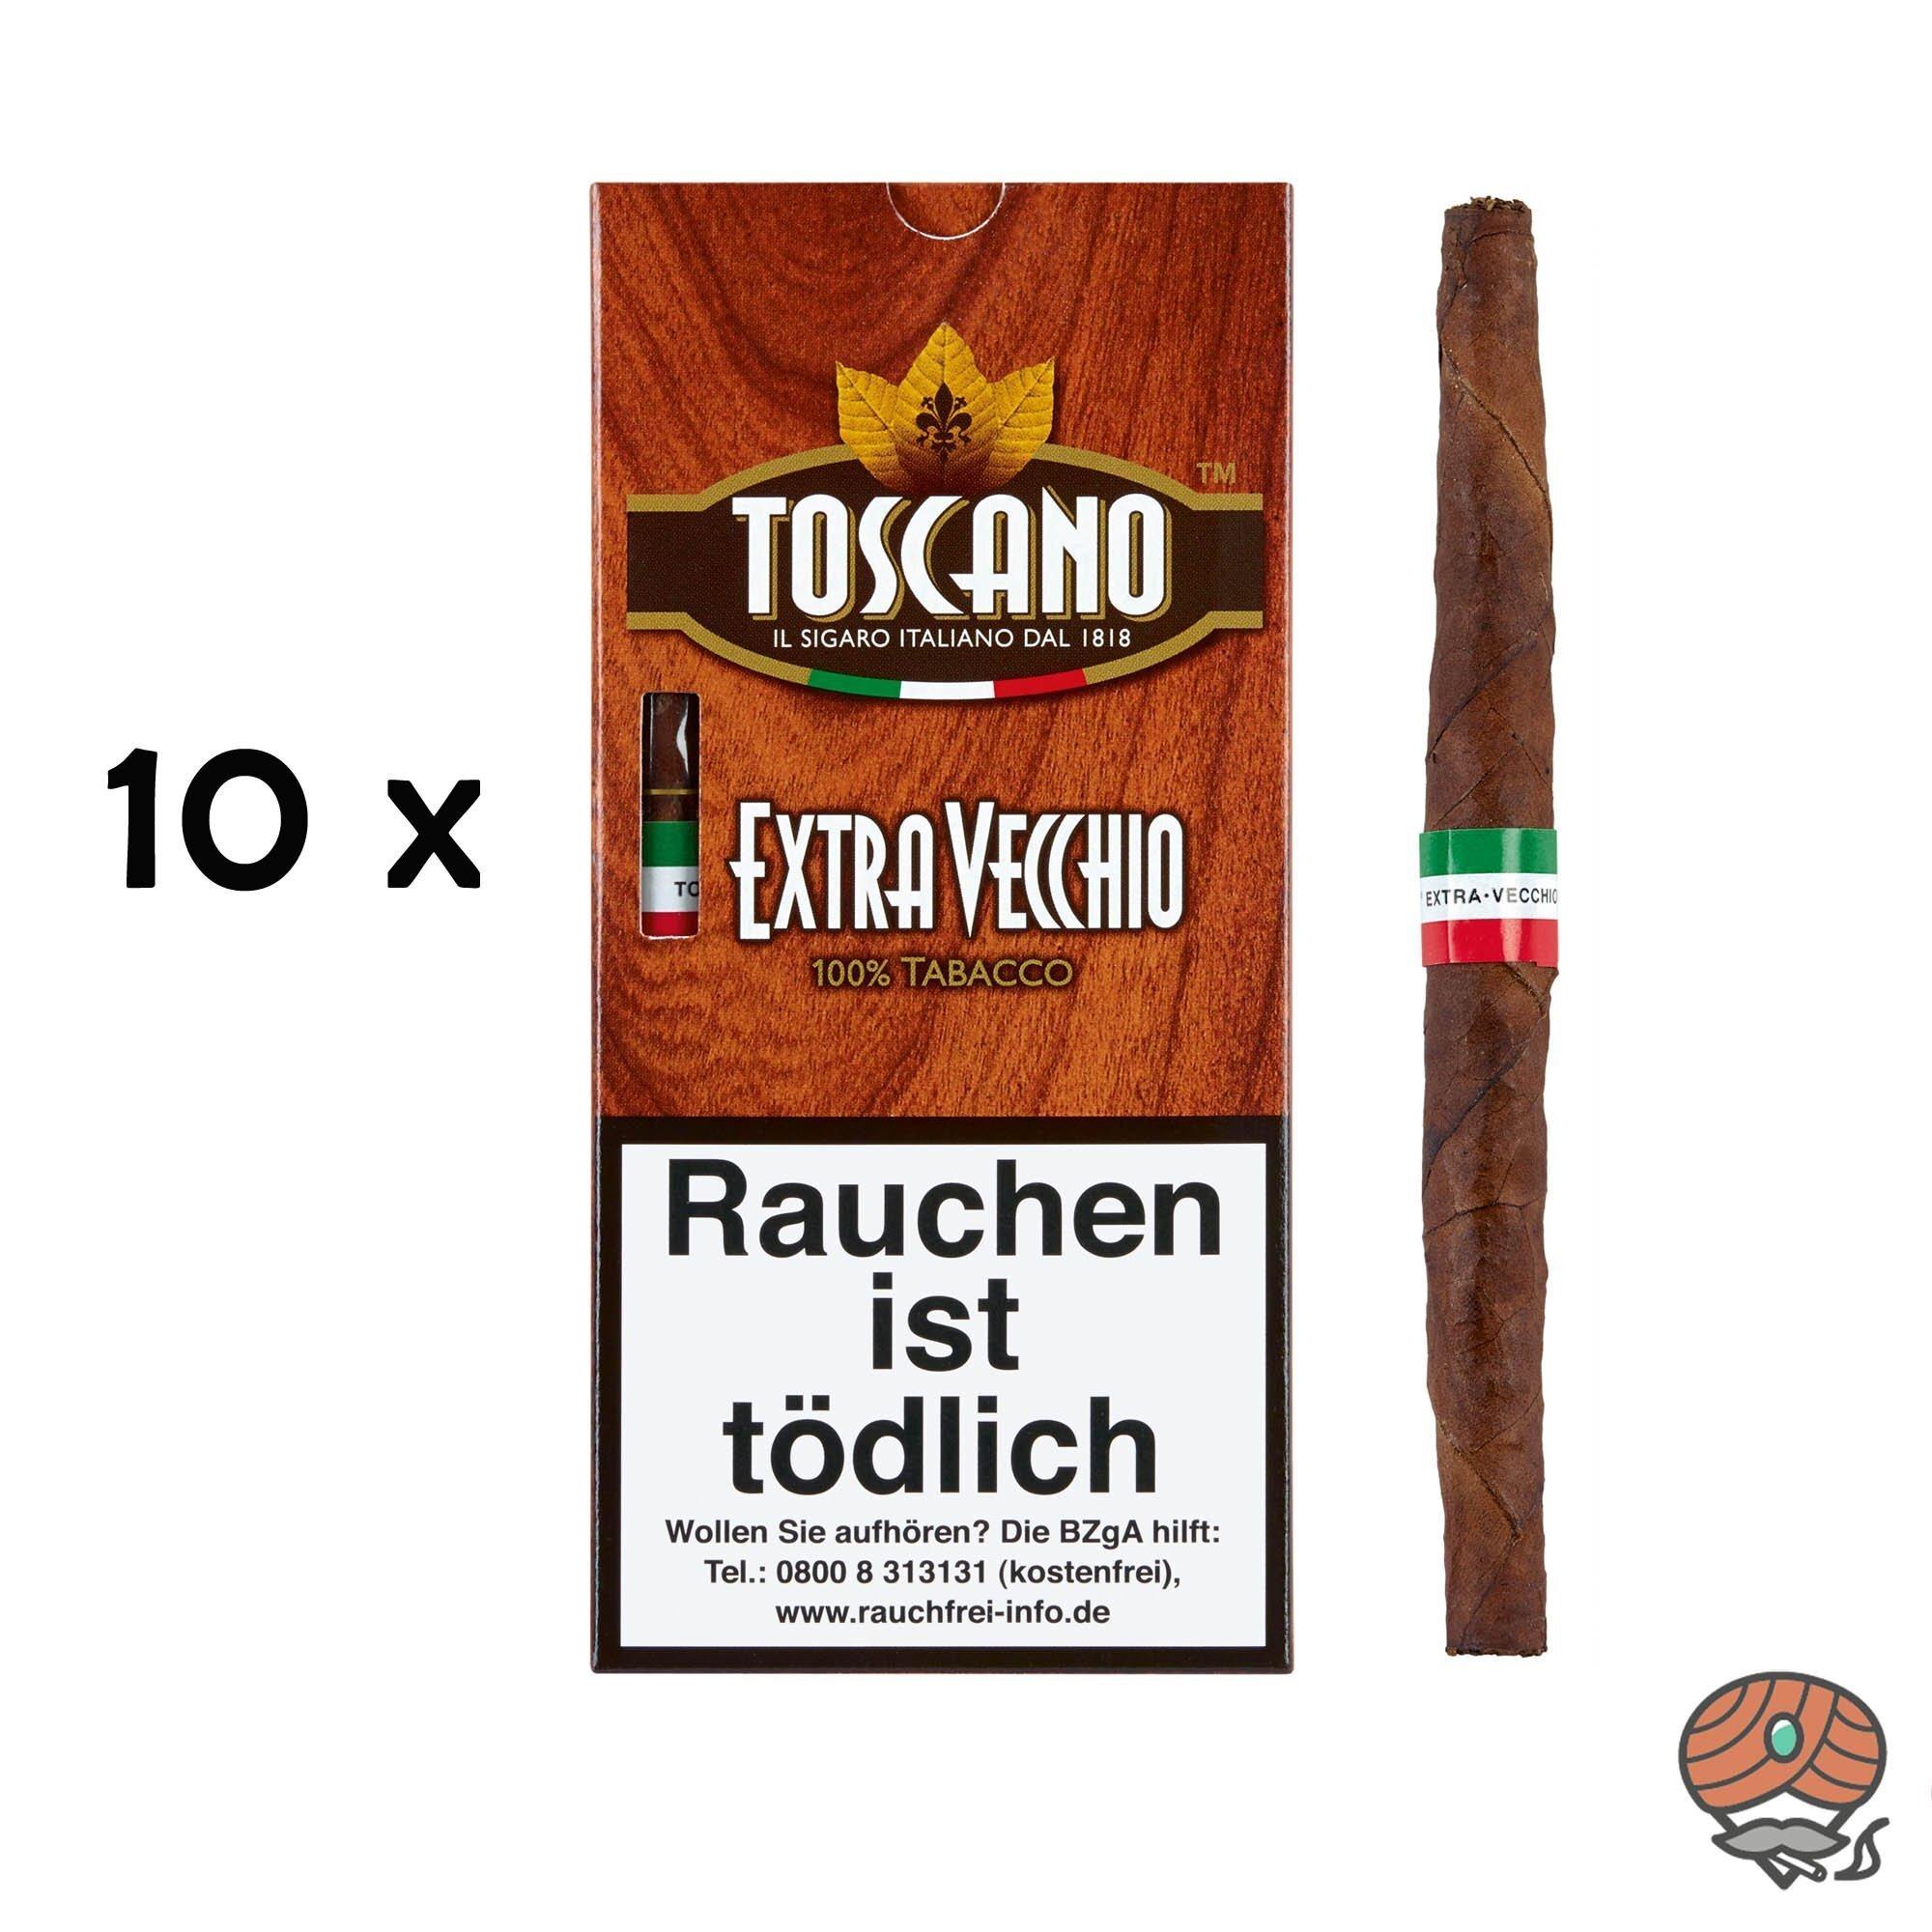 10 x Toscano Extra Vecchio 100% Tabacco Zigarren á 5 Stück